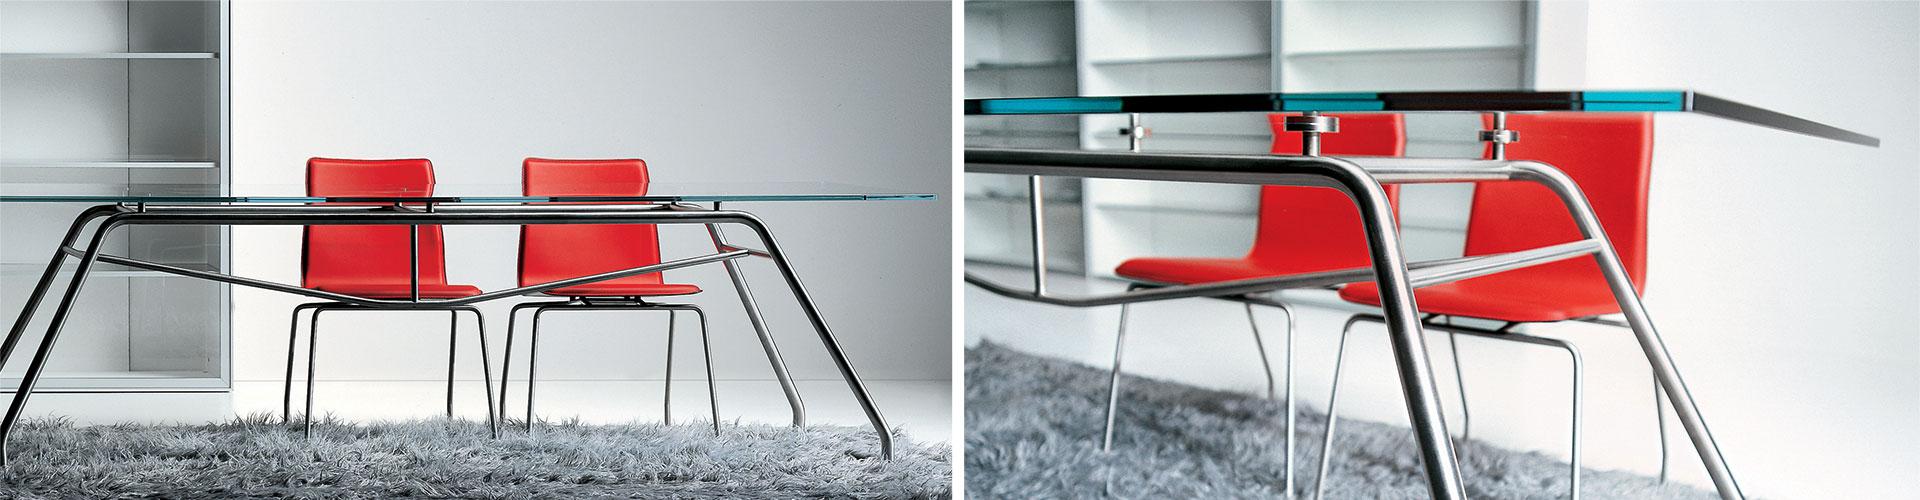 esg glas glasraum glas f r den ladenbau und innenausbau. Black Bedroom Furniture Sets. Home Design Ideas